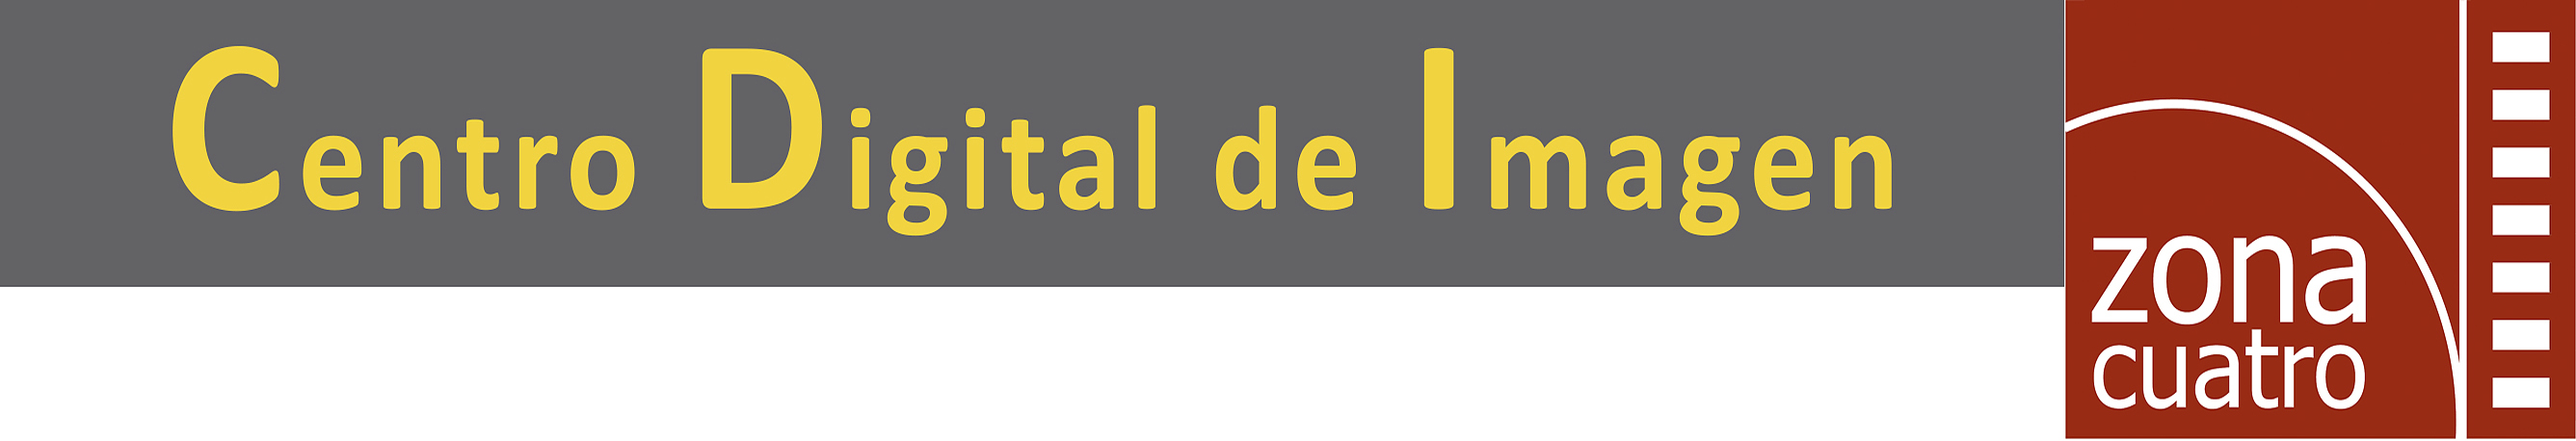 Centro Digital de Imagen